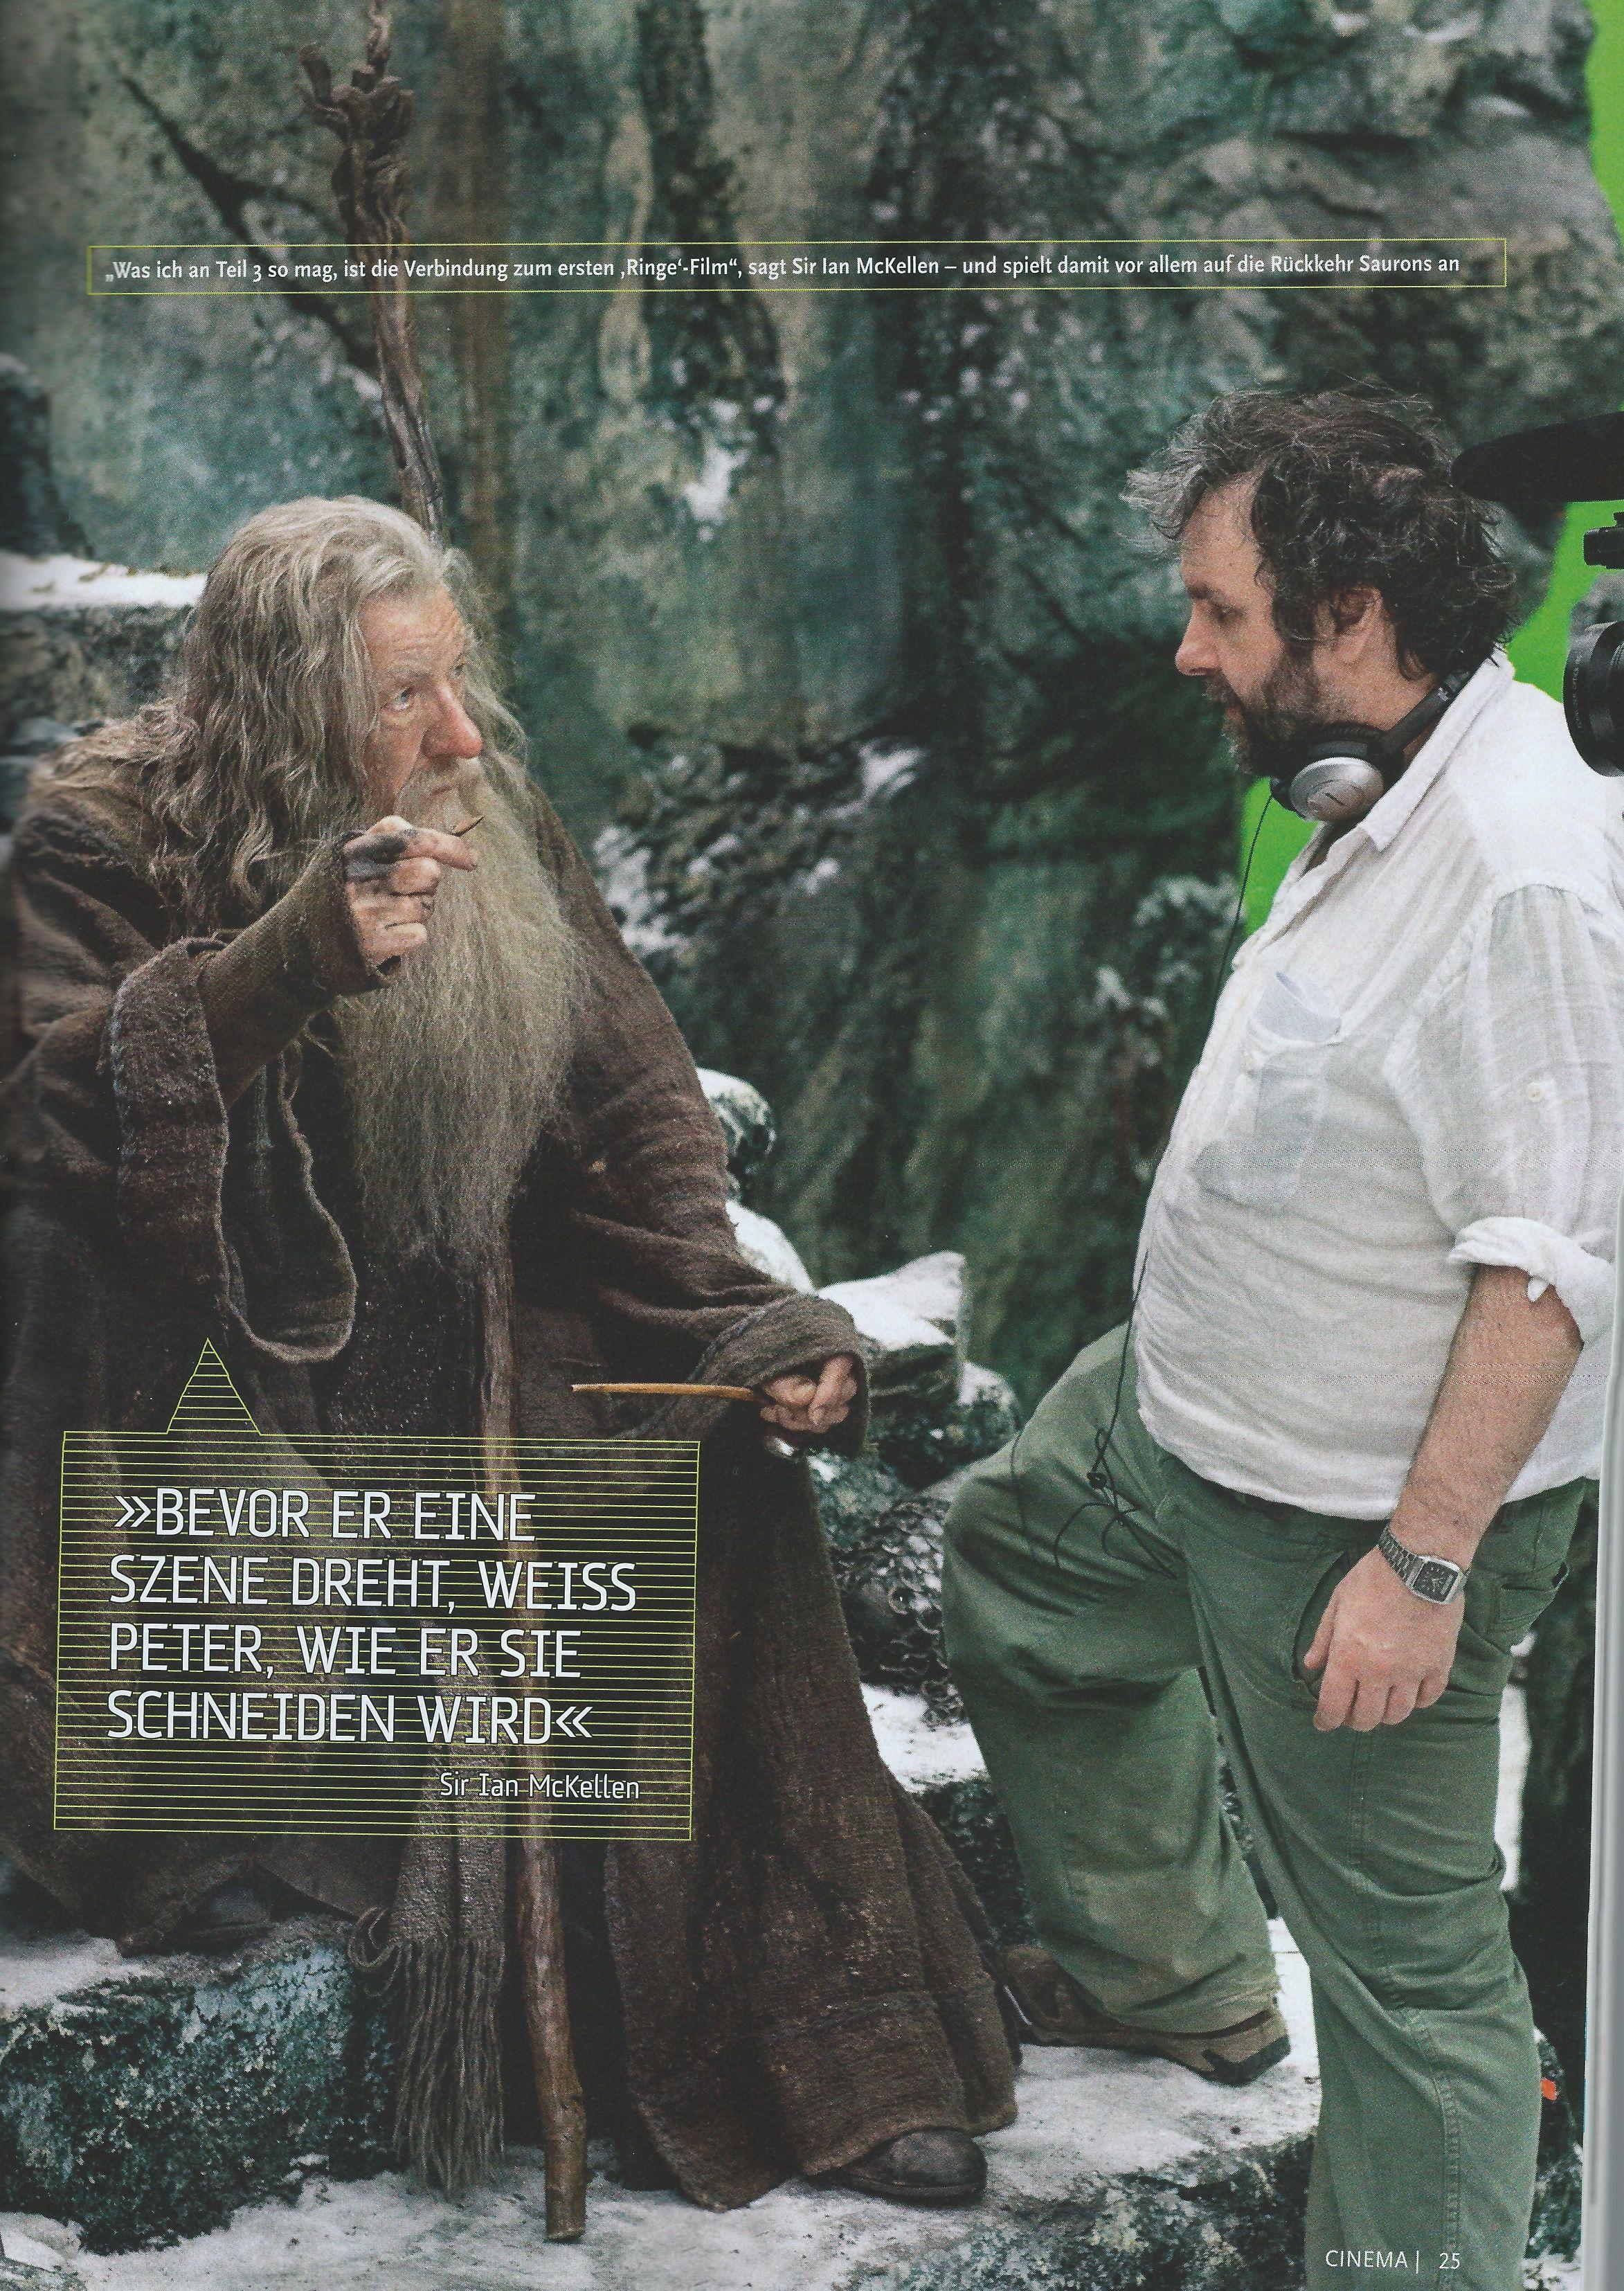 The Hobbit: The Battle of the Five Armies - Cinema Magazine